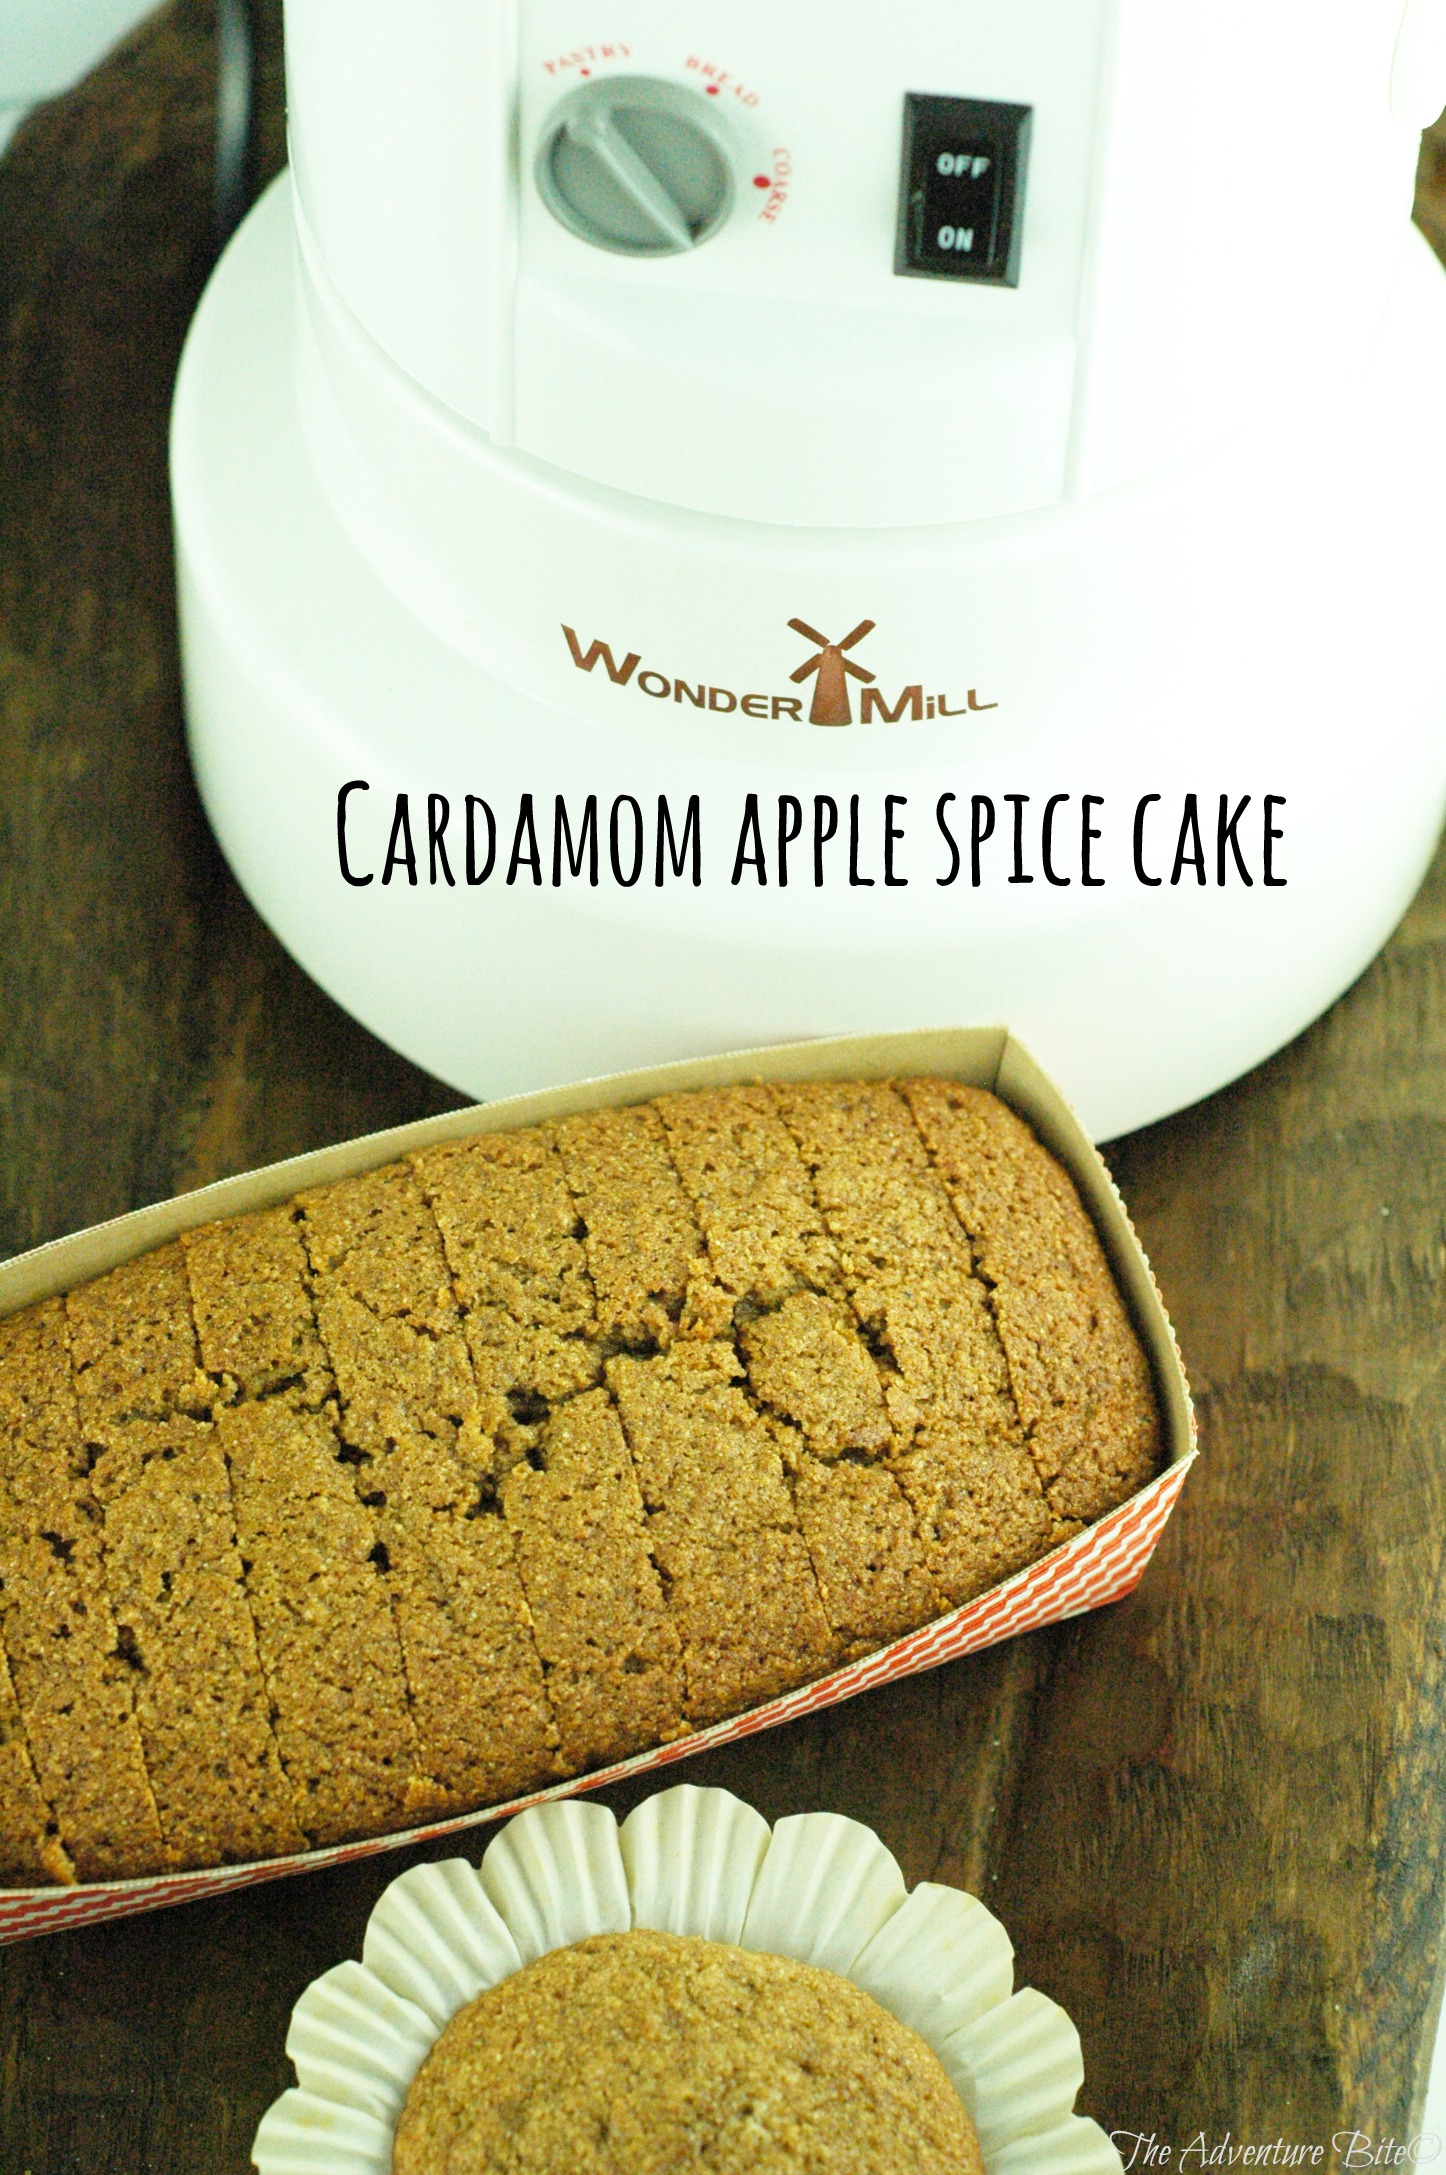 Cardamom Apple Spice Cake